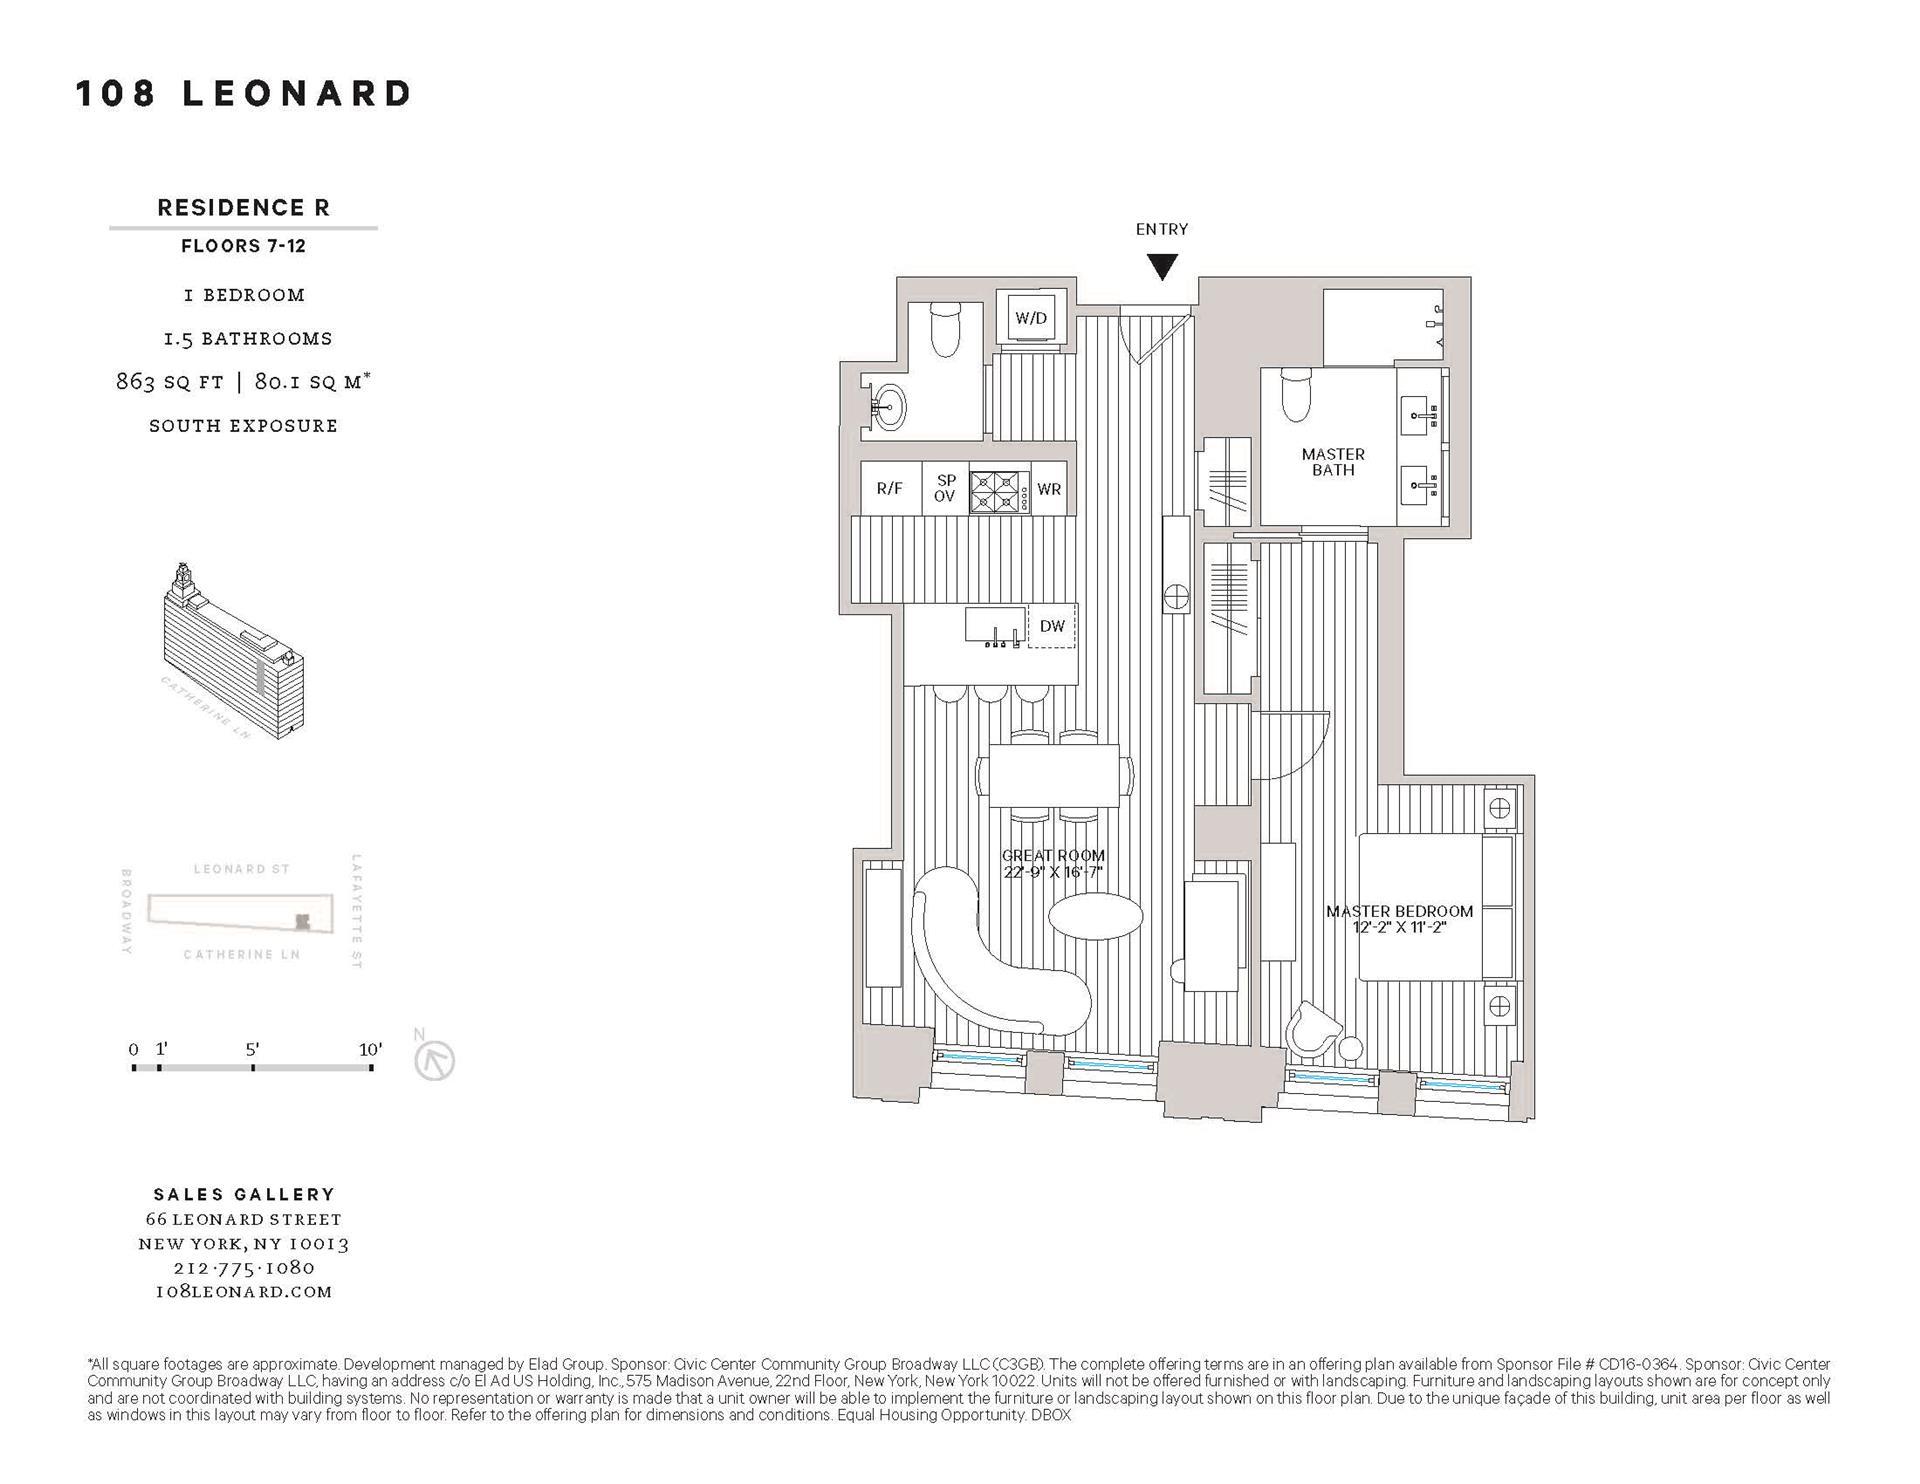 Floor plan of 108 Leonard St, 9R - TriBeCa, New York